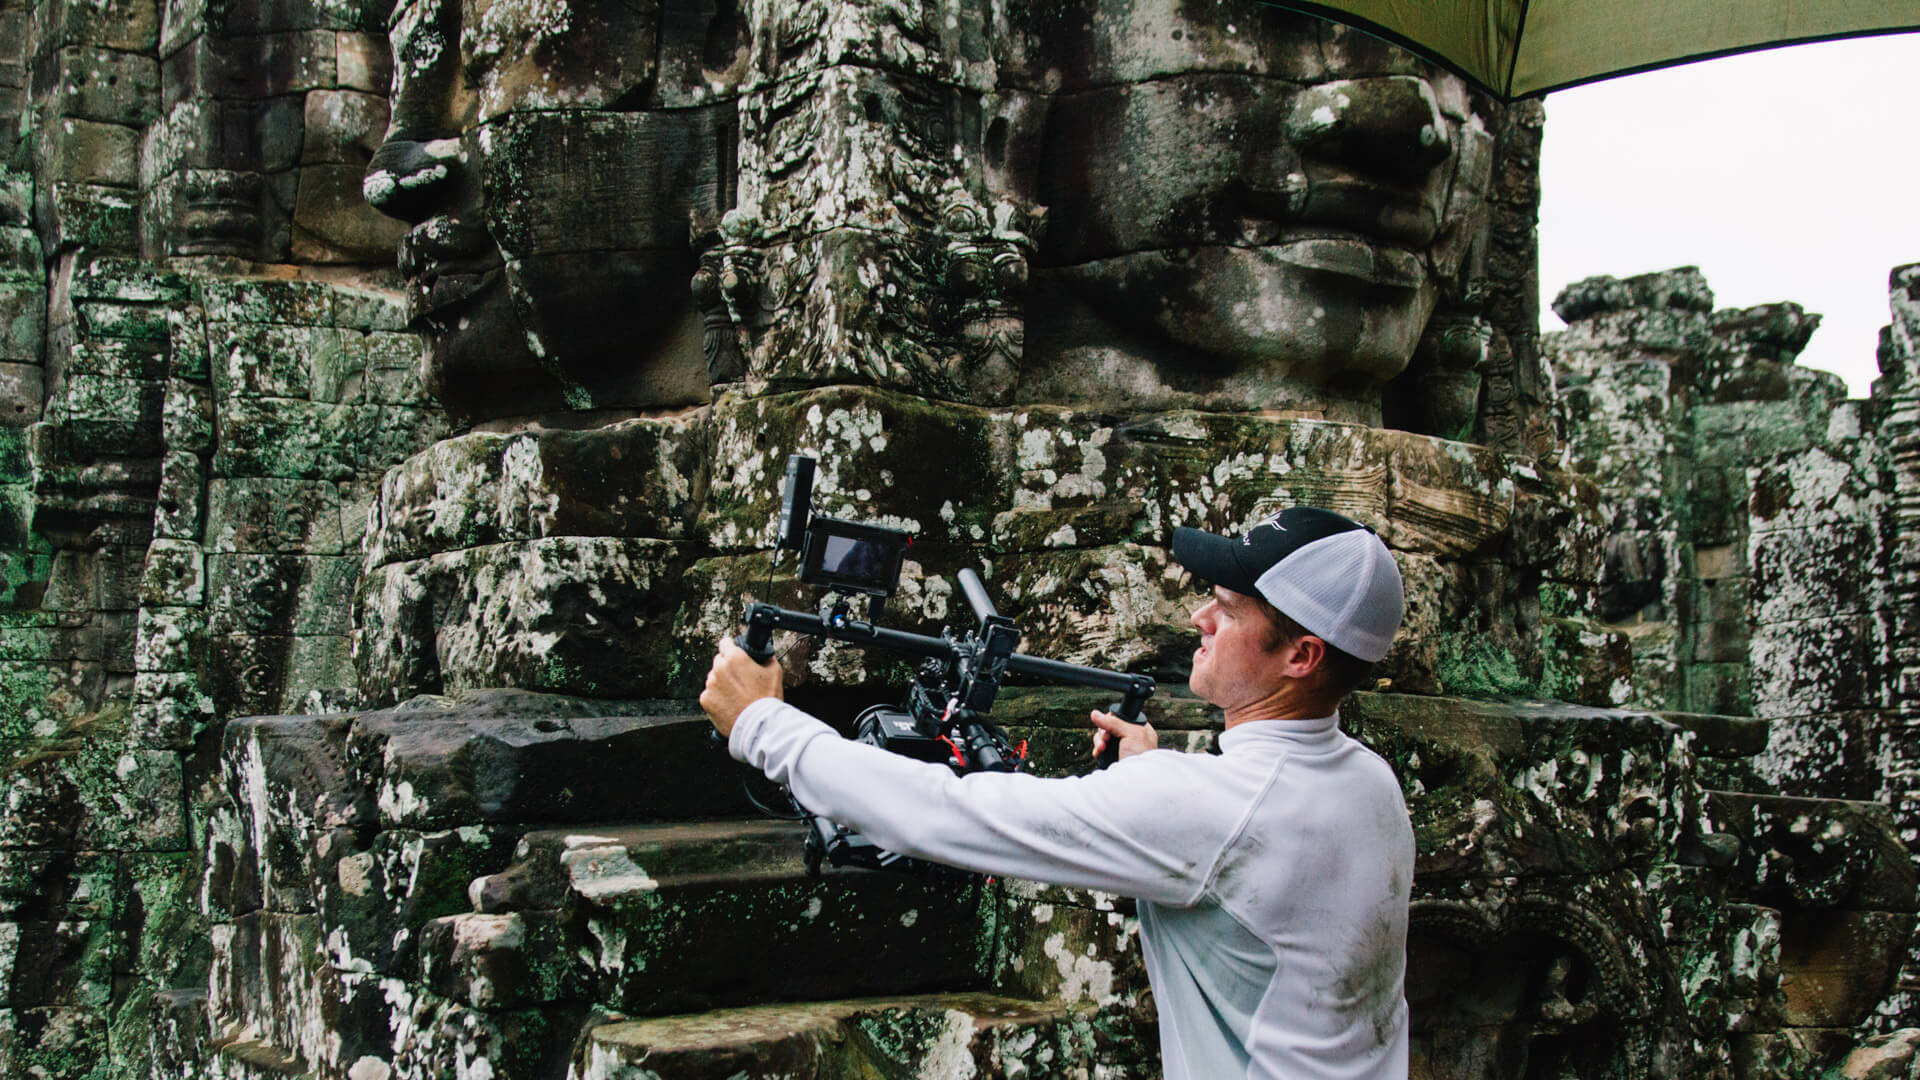 movi-operator-sam-nuttmann-cambodia-bbc-monsoon-temples